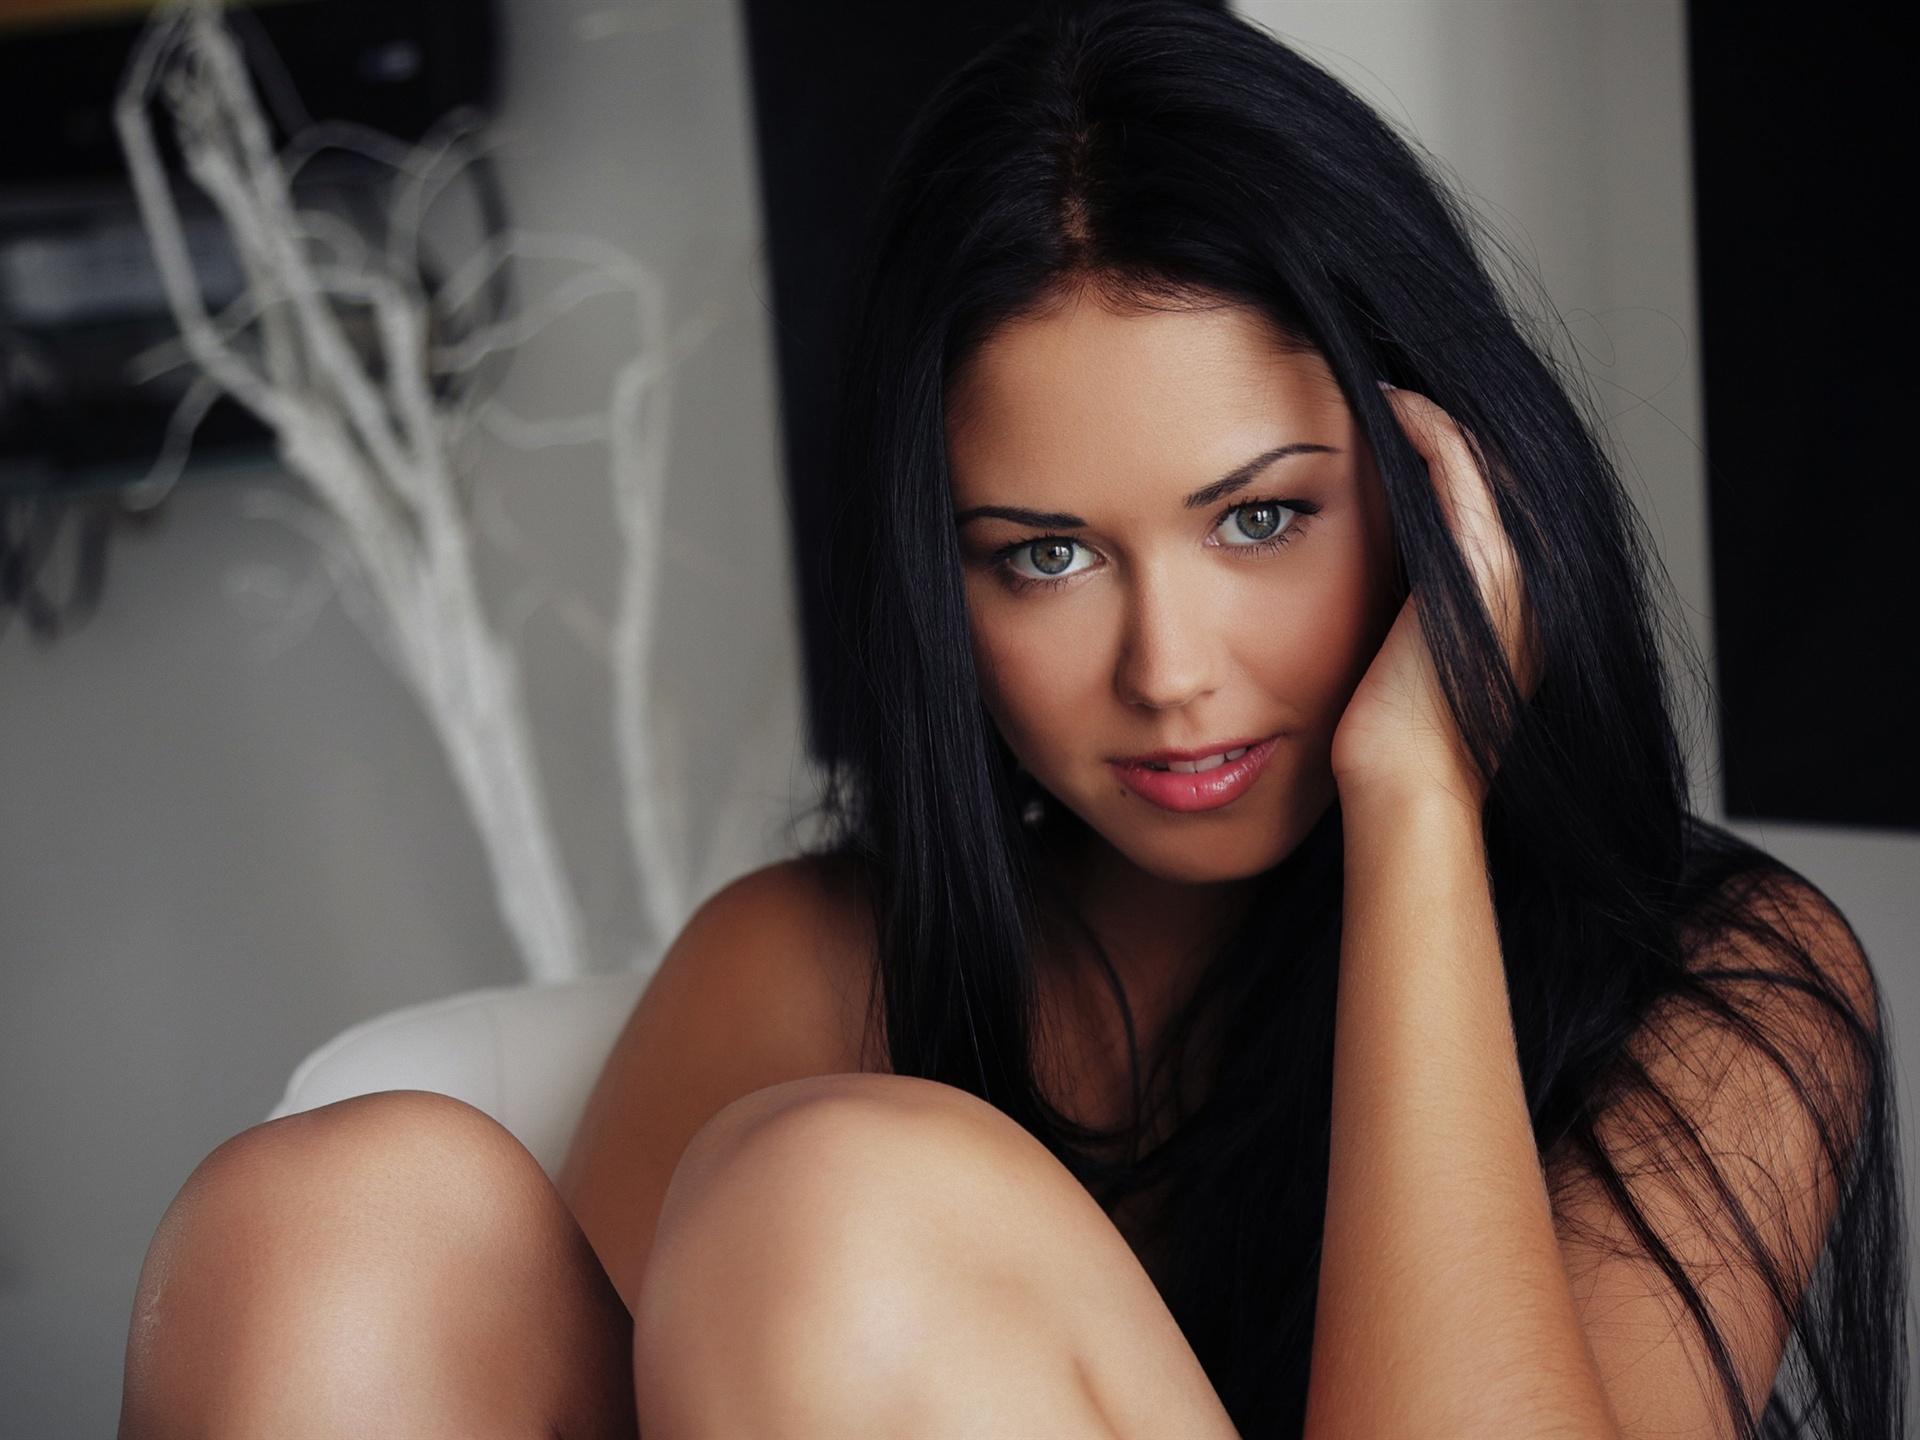 Beautiful black hair pure girl eyes face wallpaper 1920x1440